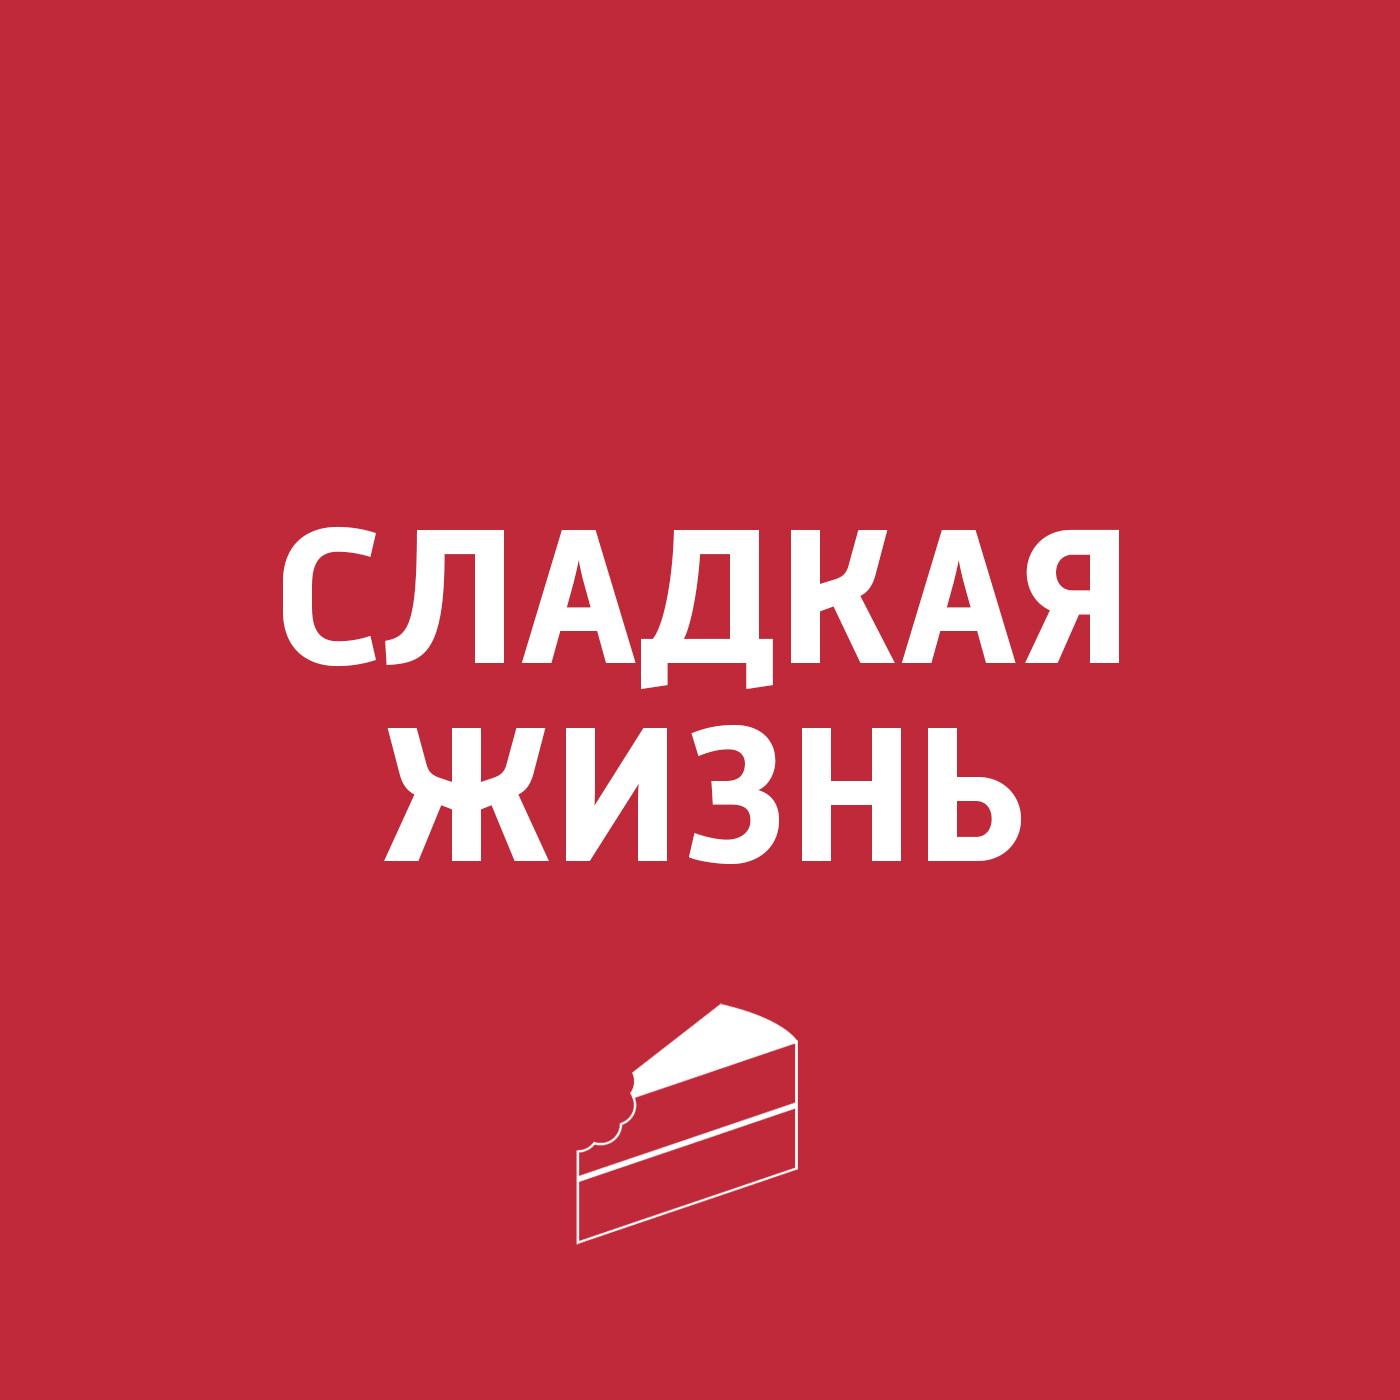 Картаев Павел Шоколад rich шоколад горький с лаймом 70 г